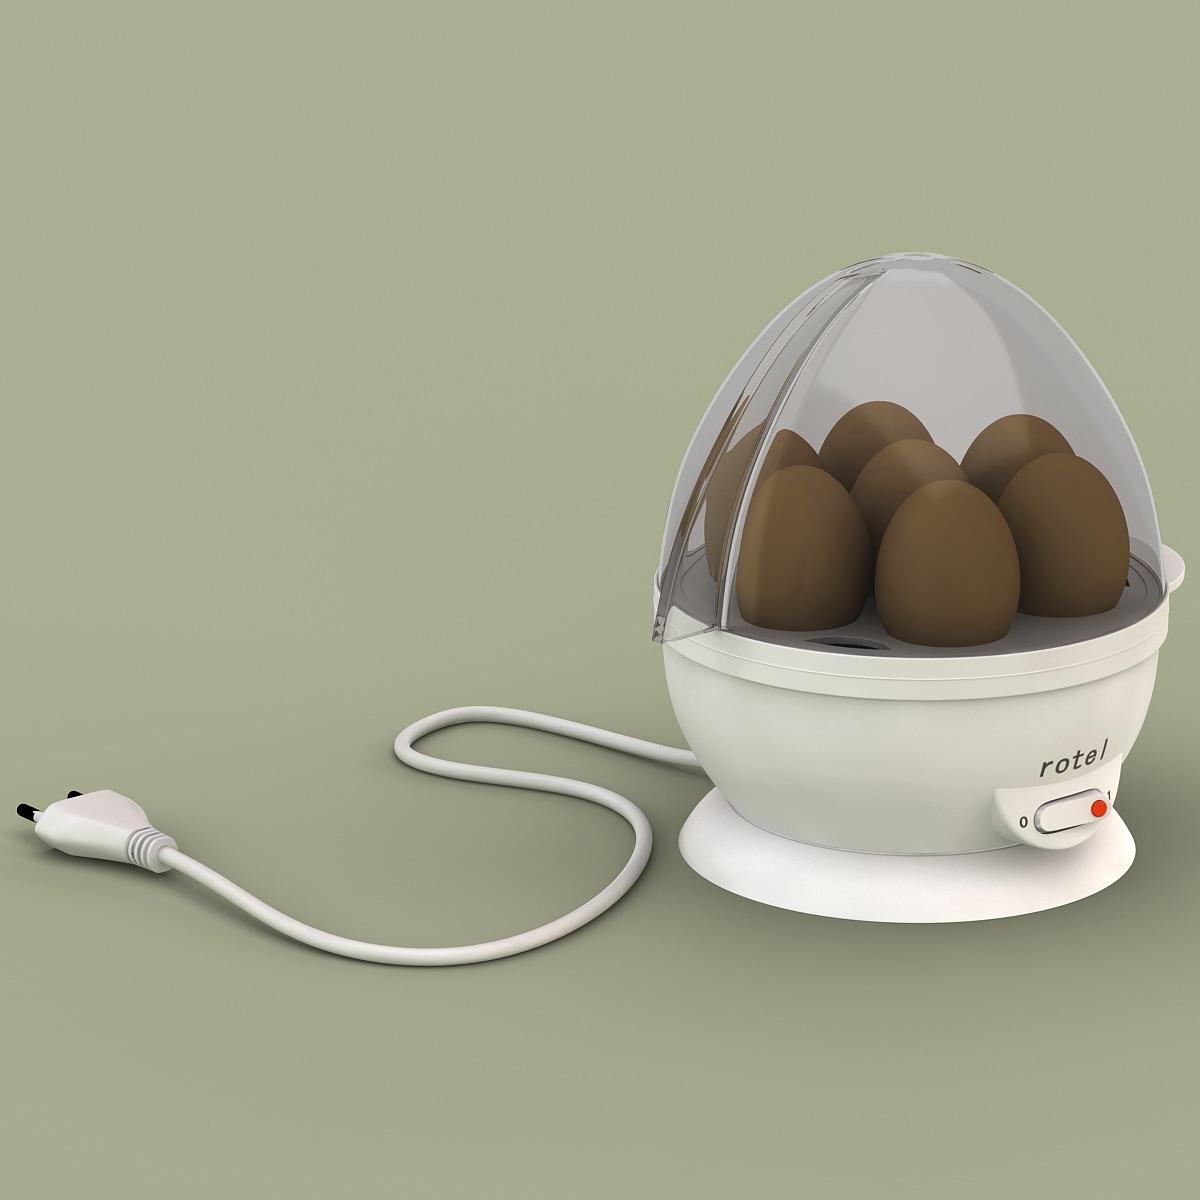 Egg_Cooker_Rotel_U14_001.jpg